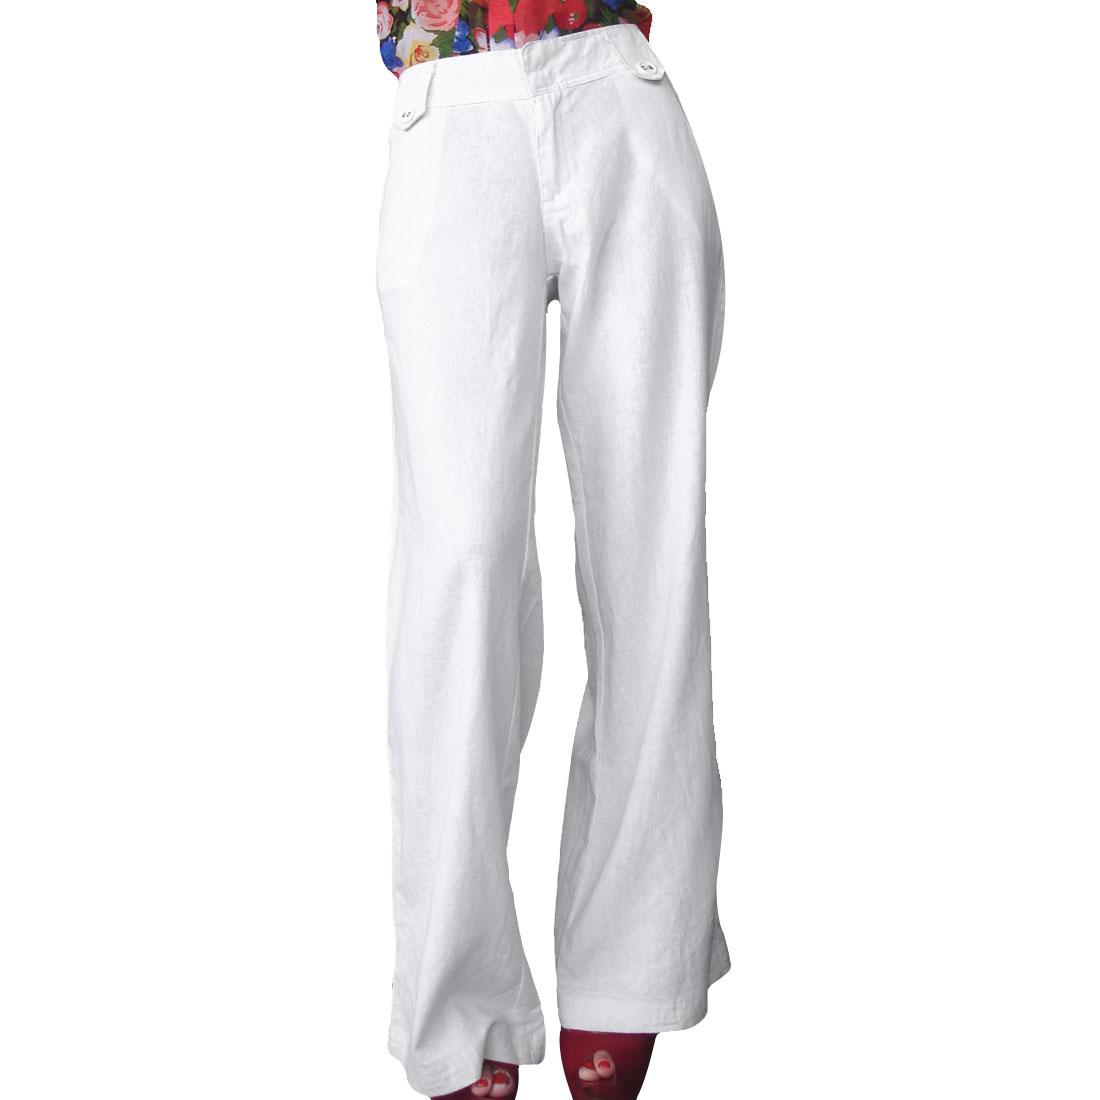 Ladies Belt Look Loose Charming Zipper Closure Trousers Pants White XL